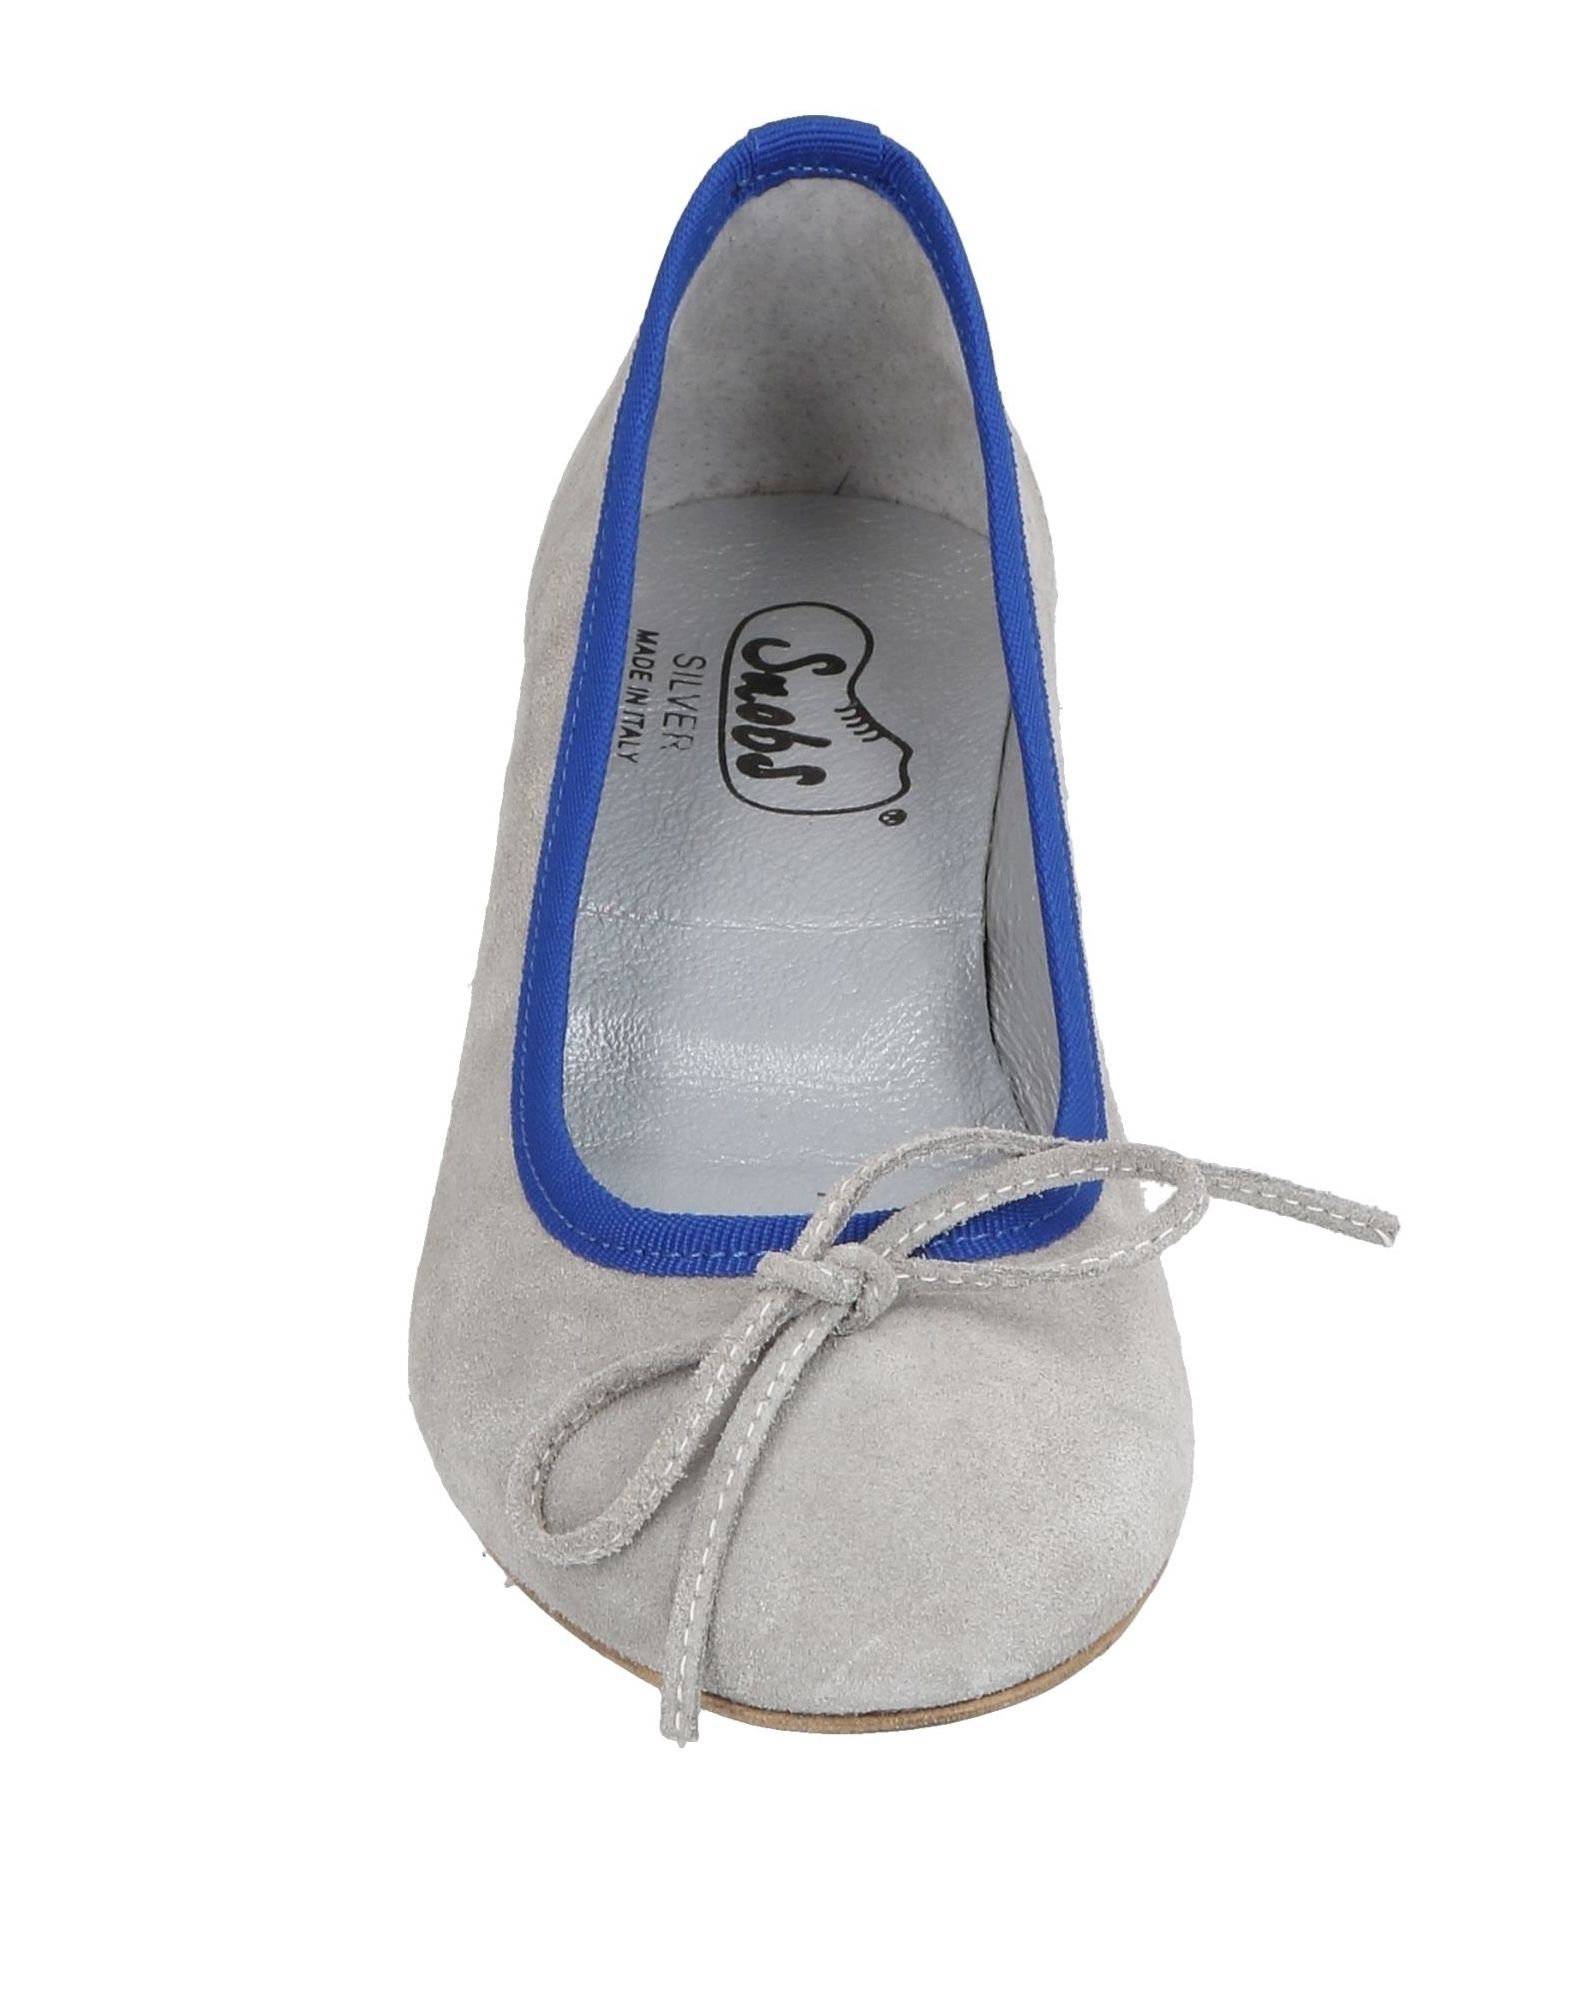 Snobs® Ballerinas Damen   Damen 11457537WW  765780